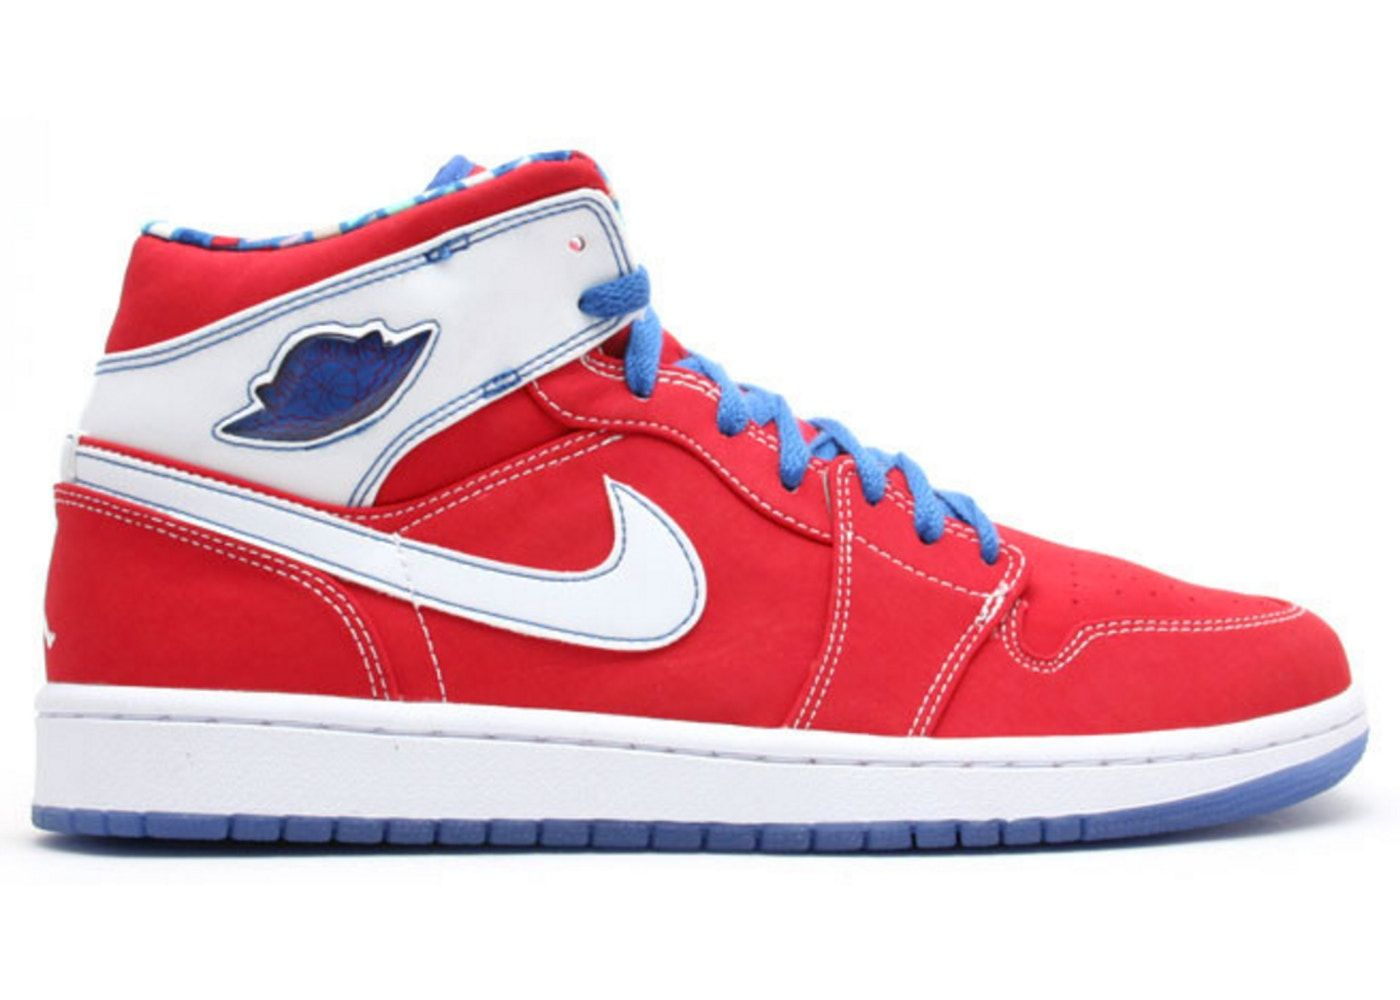 Jordan 1 Retro LS Sport Red Blue jordans, Jordan 1, Jordans